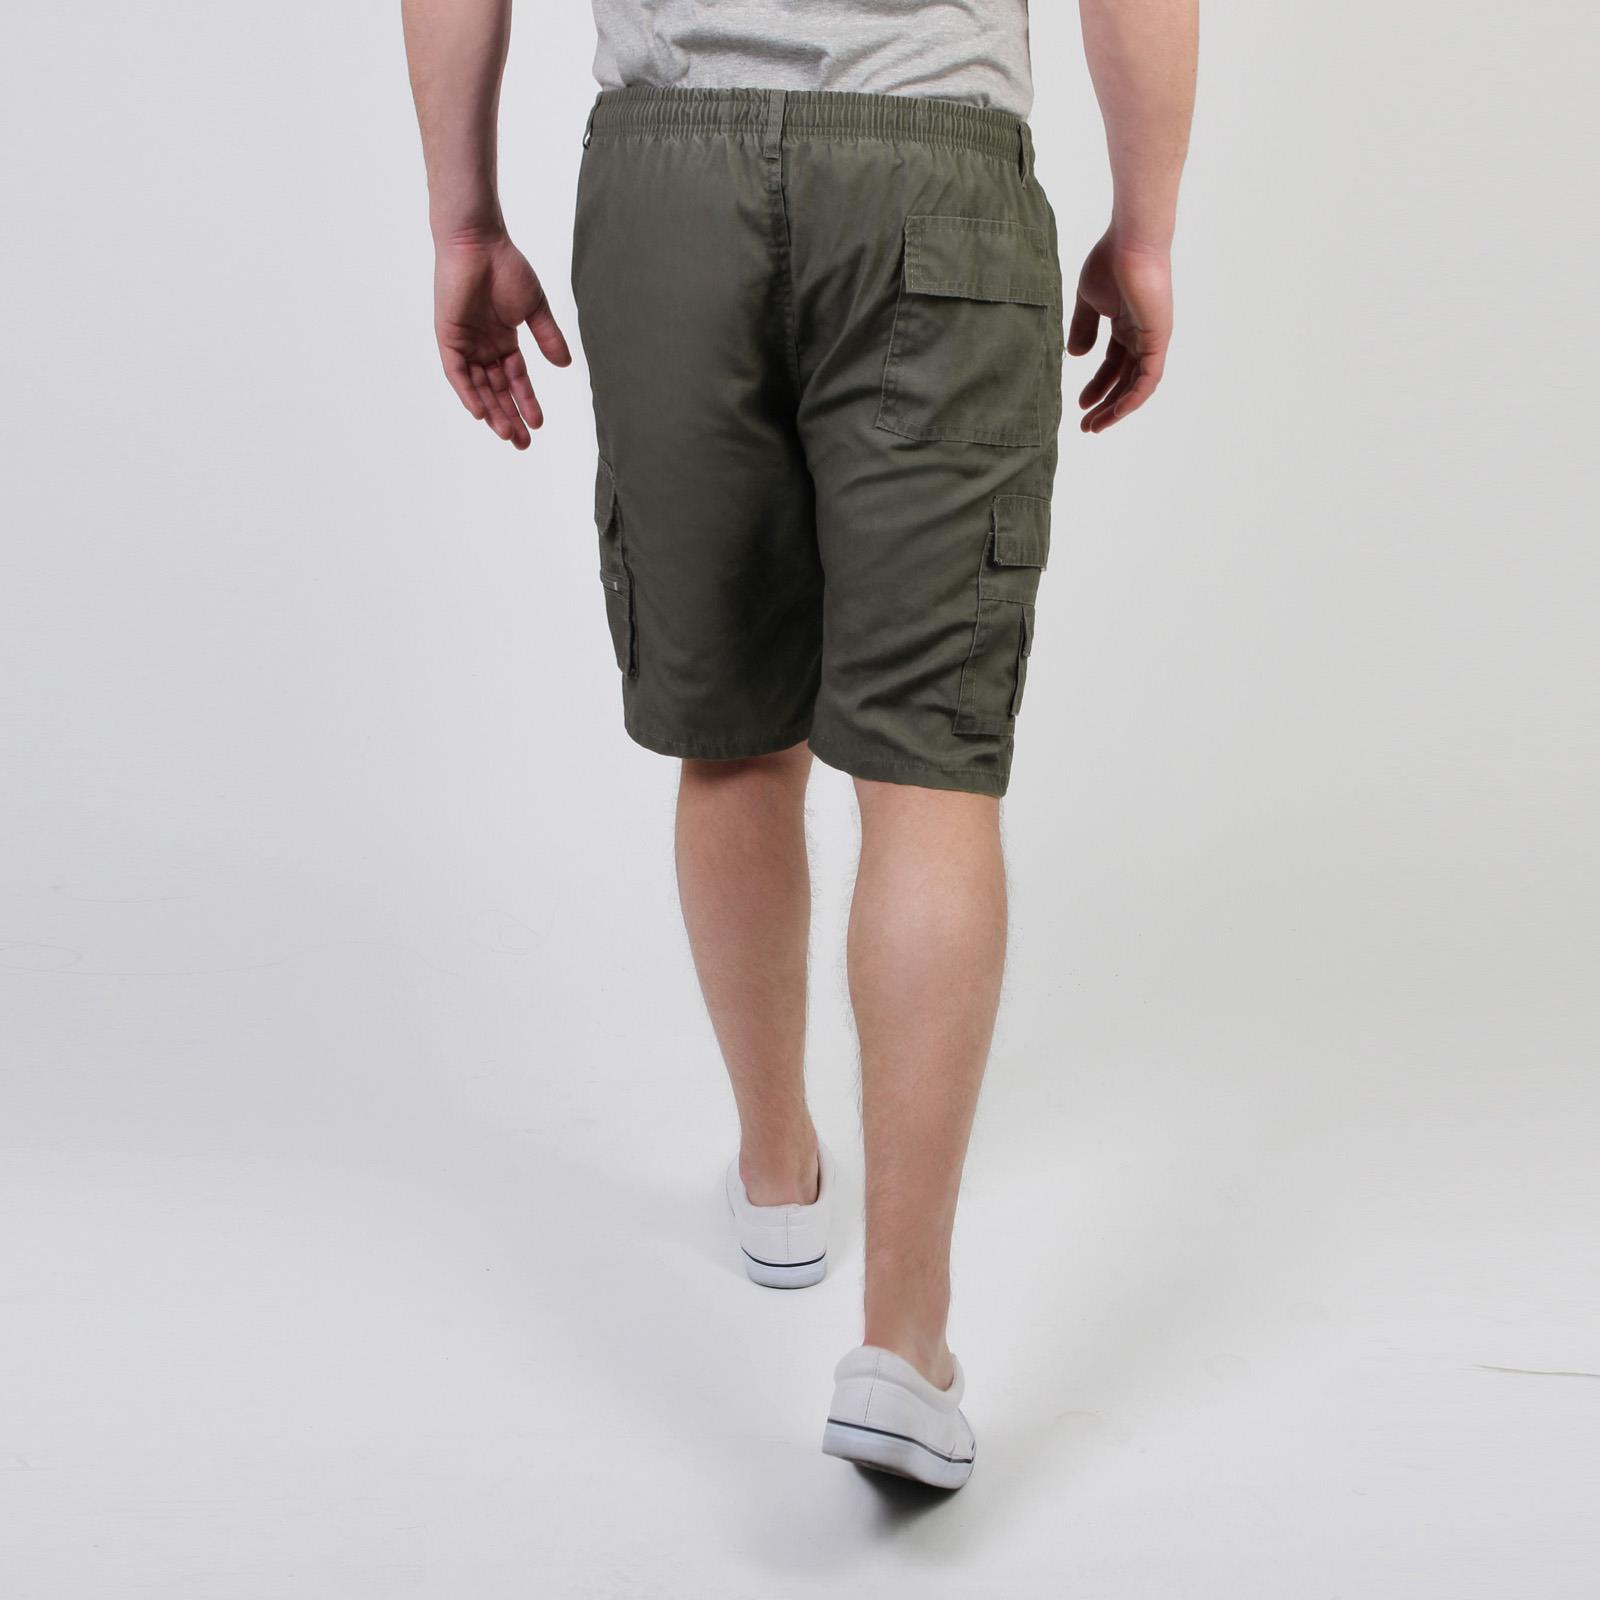 Mens-Cotton-Cargo-Shorts-Plain-Basic-Casual-Work-Chinos-Combat-Pants-Regular thumbnail 3